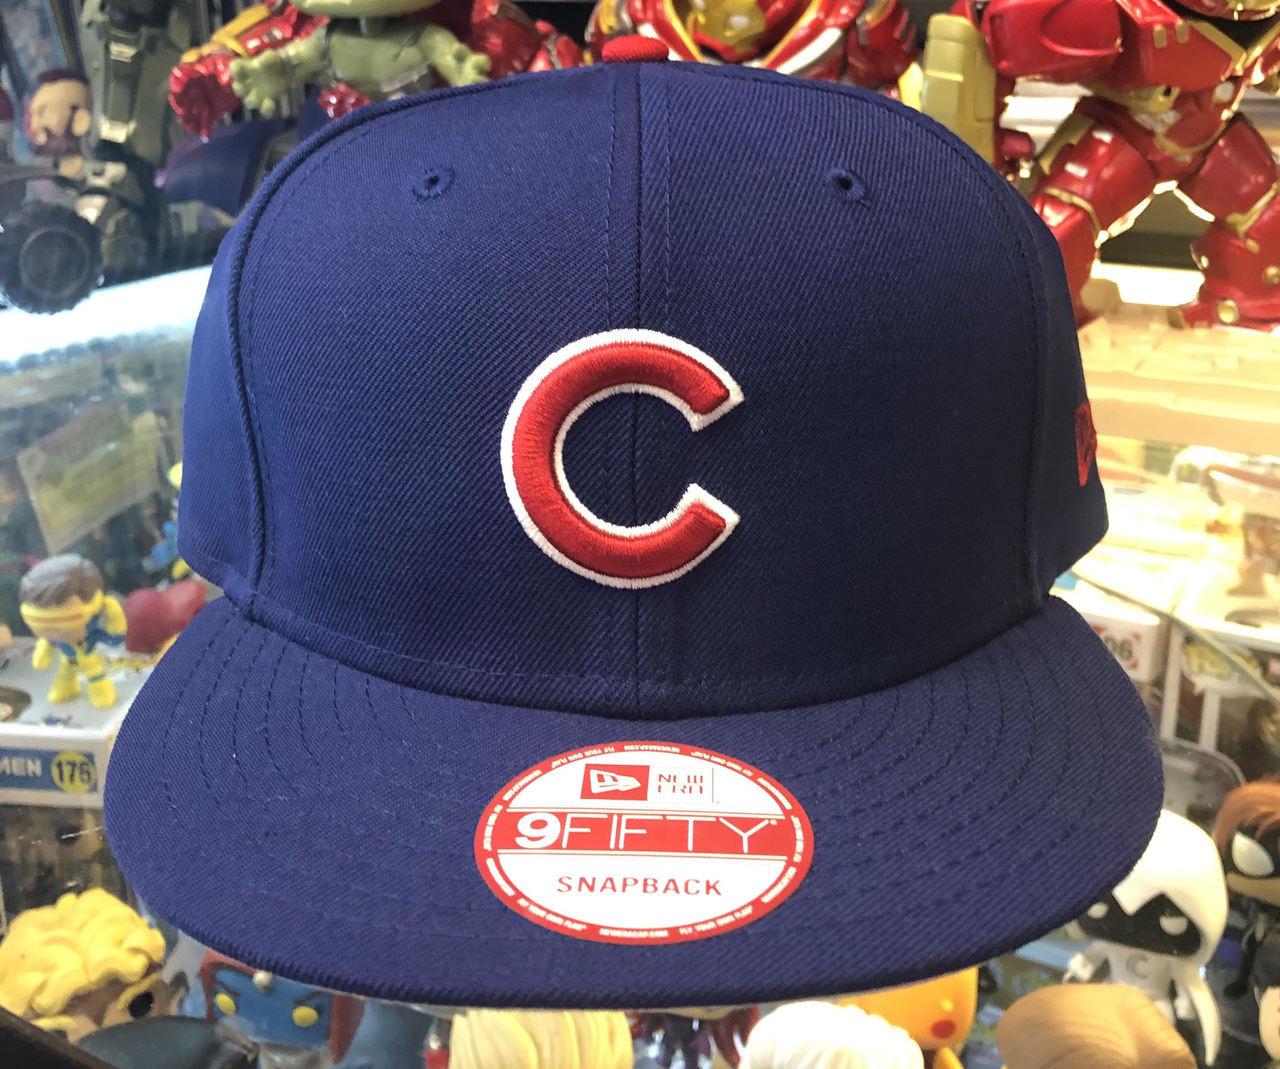 08b98f2fbd2 Chicago Cubs - Blue New Era 9Fifty MLB Snapback Hat